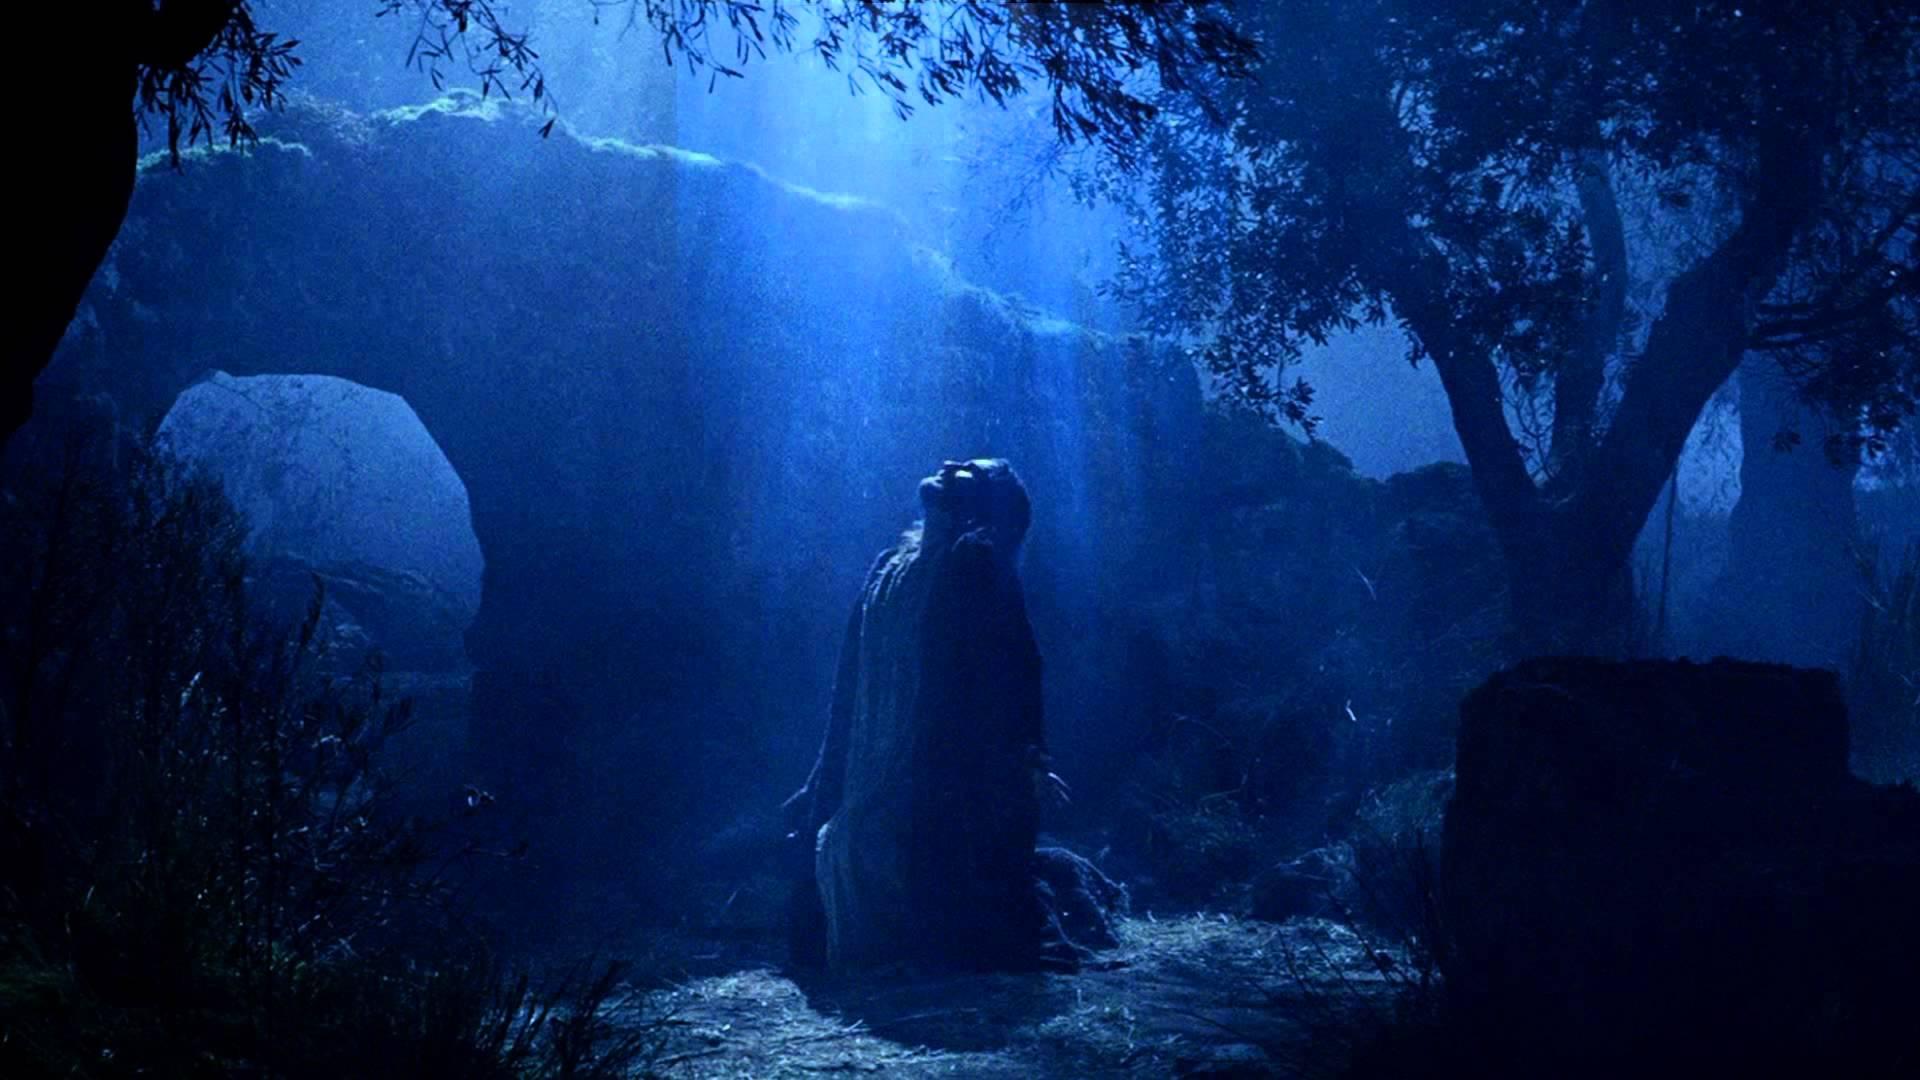 Jesus Gethsemane Prayer  worship motion background video 1080p HD 1920x1080